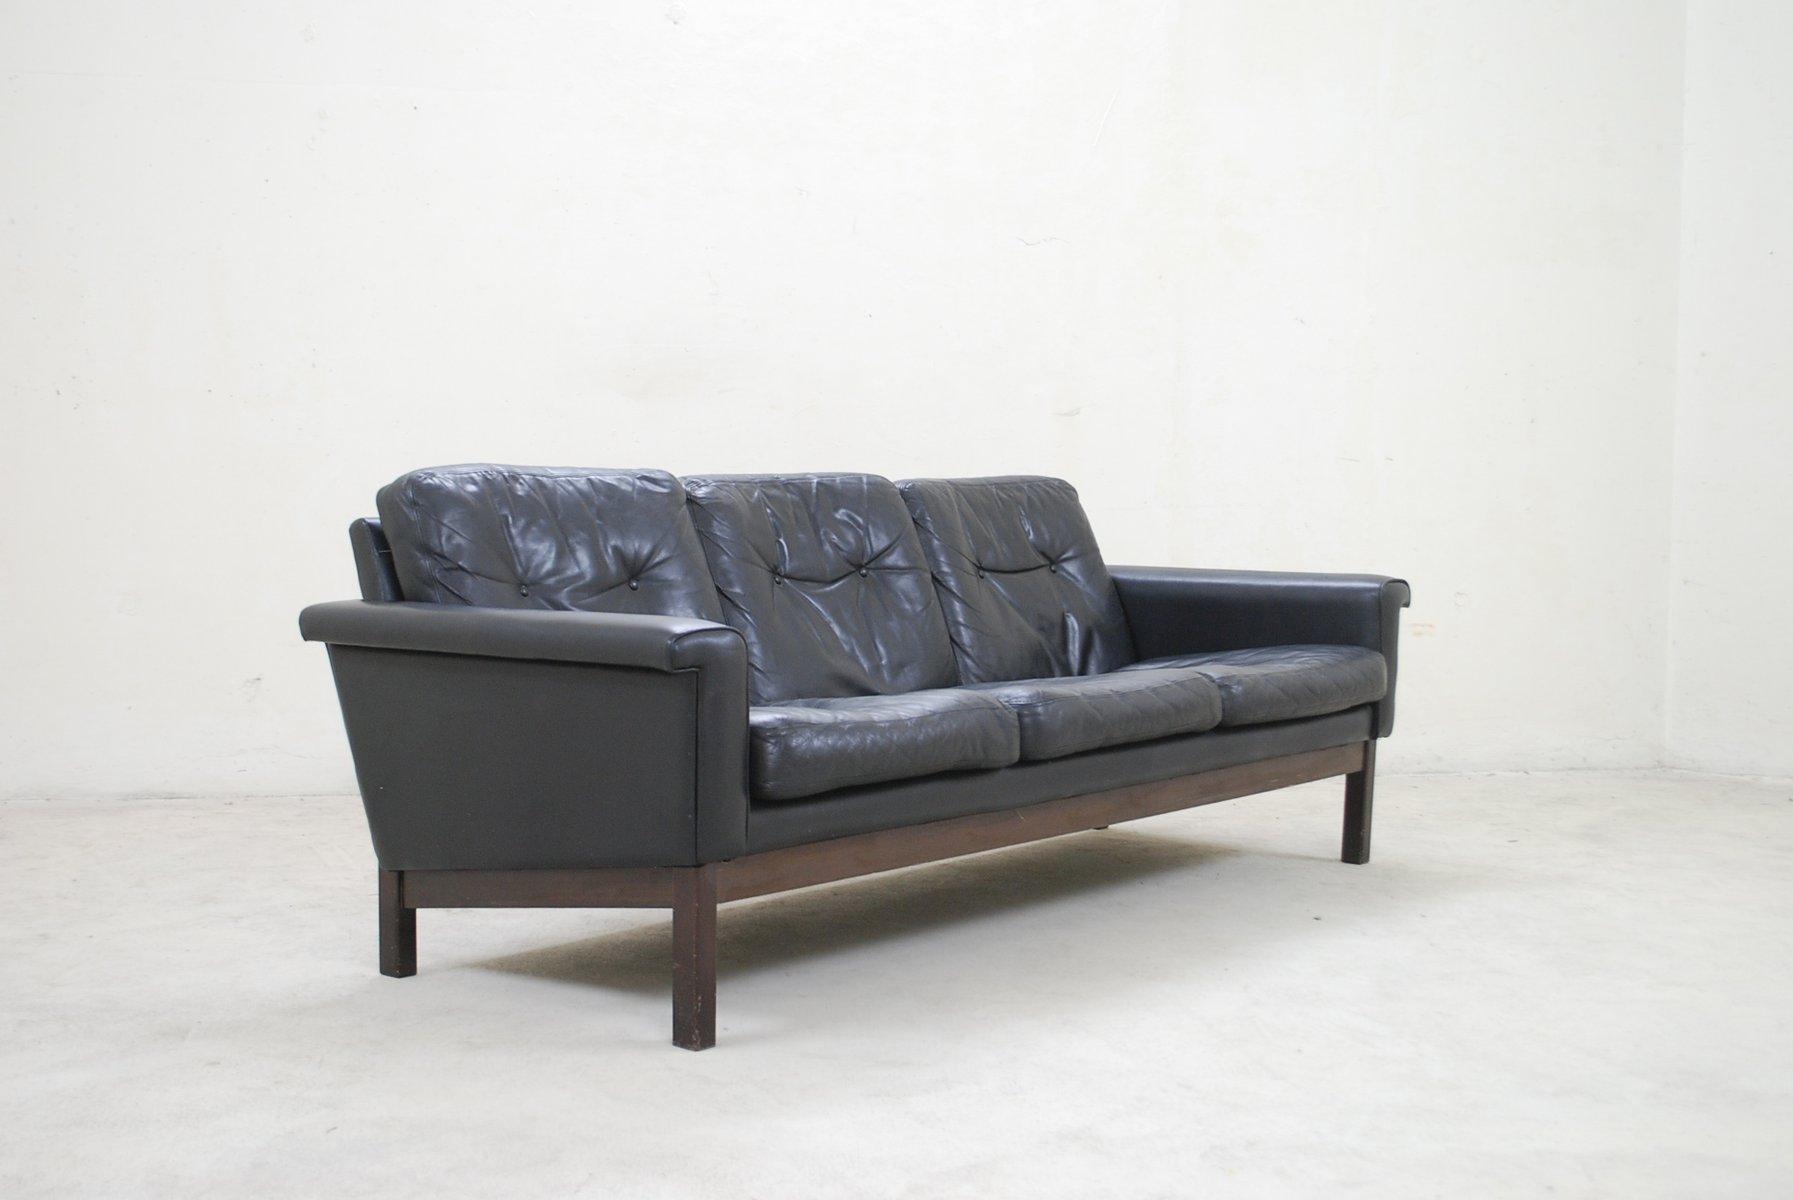 black leather sofa quick delivery donde comprar sofas baratos en zaragoza vintage from asko for sale at pamono